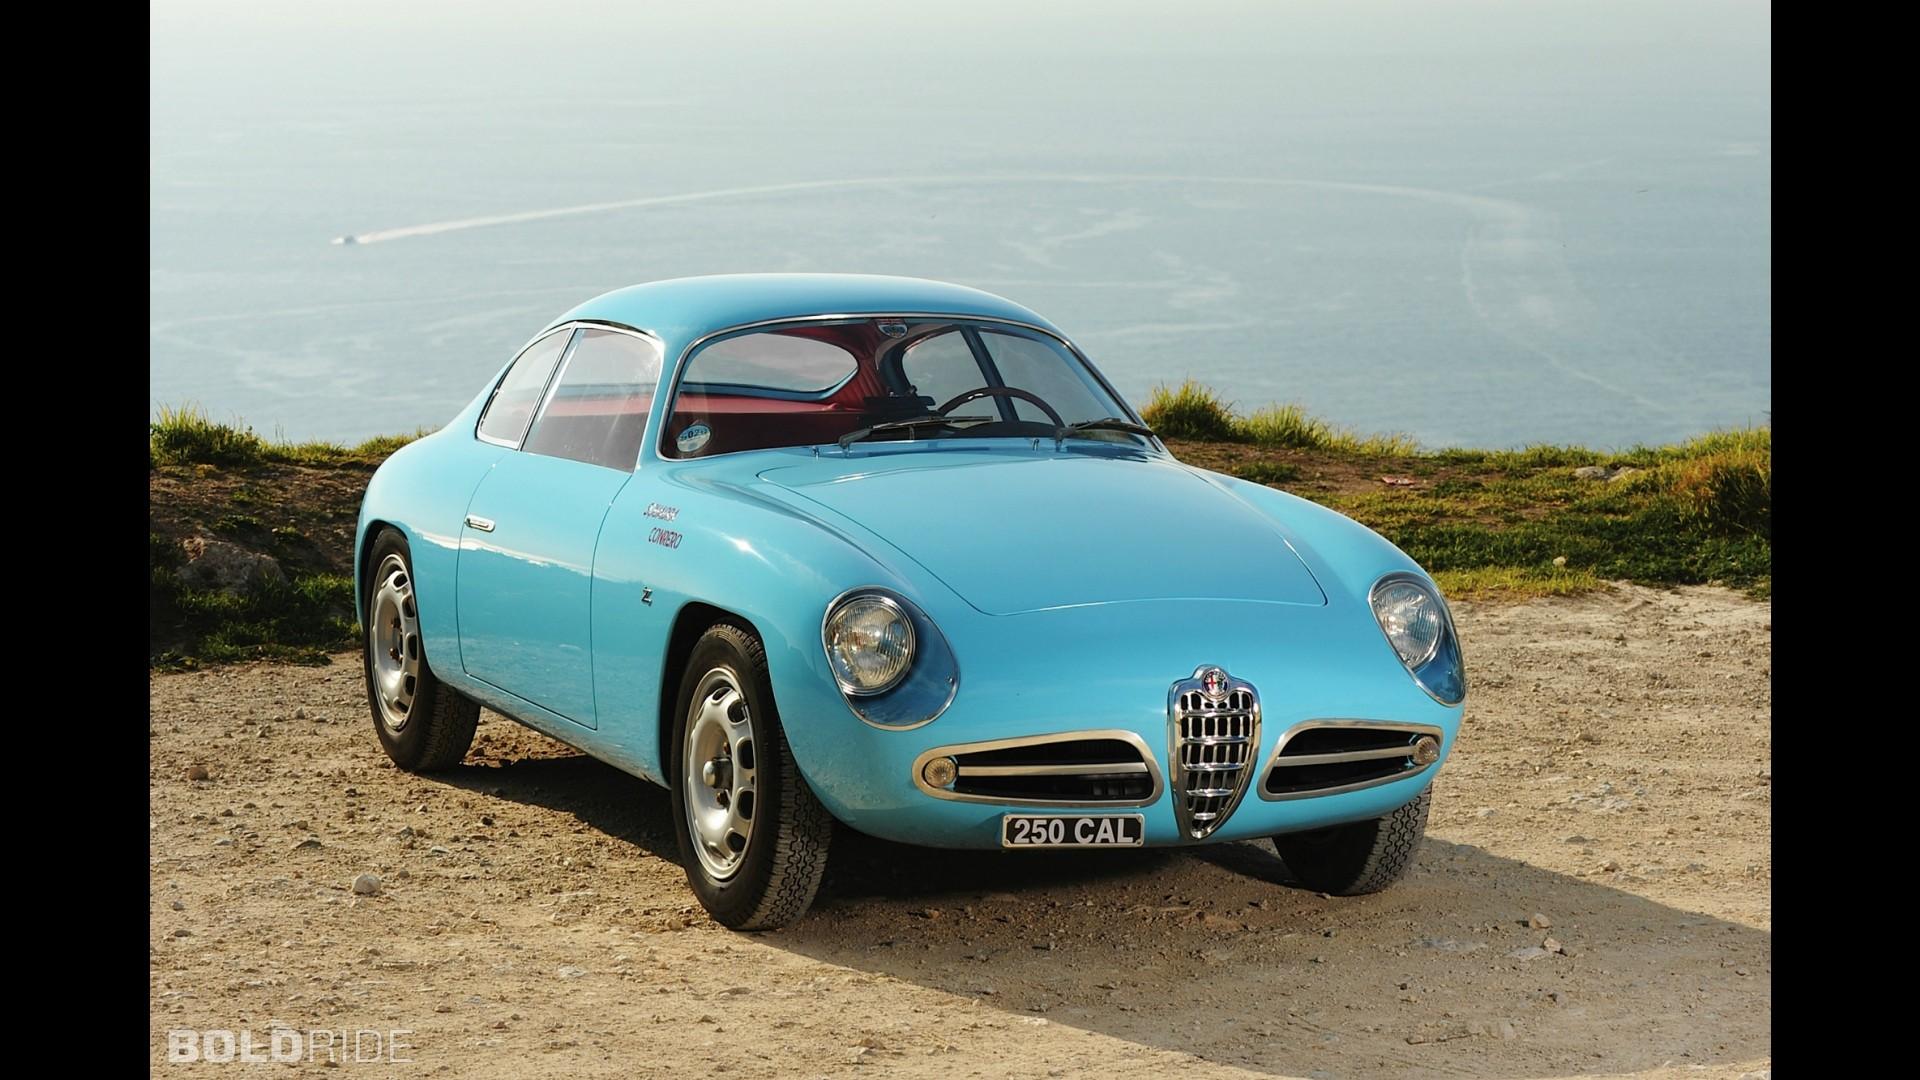 Alfa Romeo Giulietta Sprint Zagato 1961 motor1 com alfa-romeo-giulietta-sprint-veloce-zagato